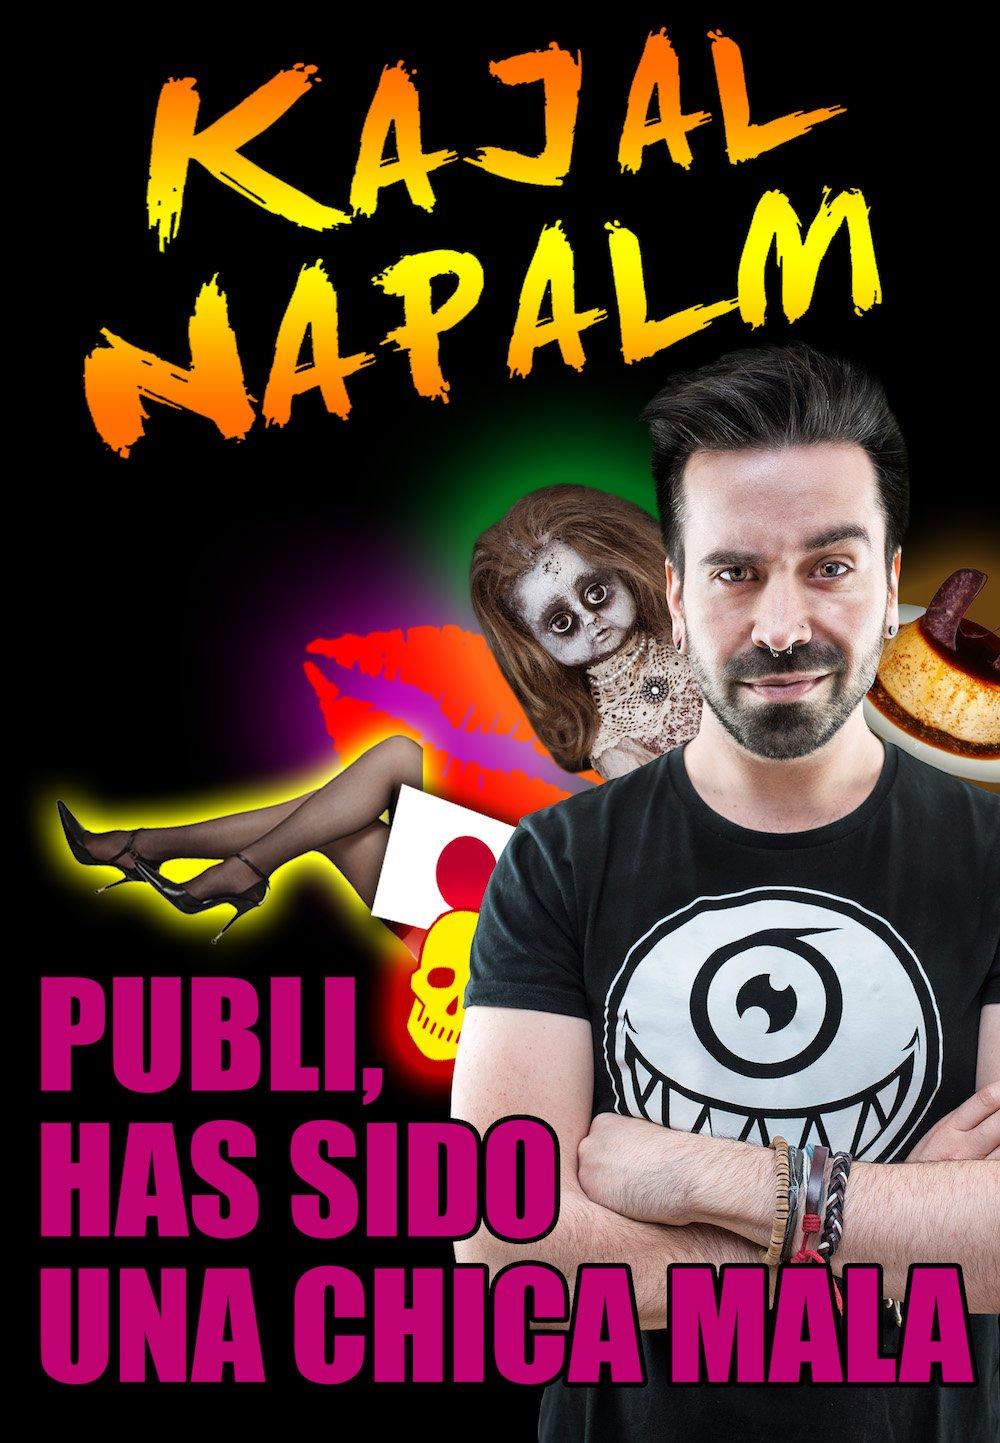 Publi, has sido una chica mala (Spanish Edition) PDF